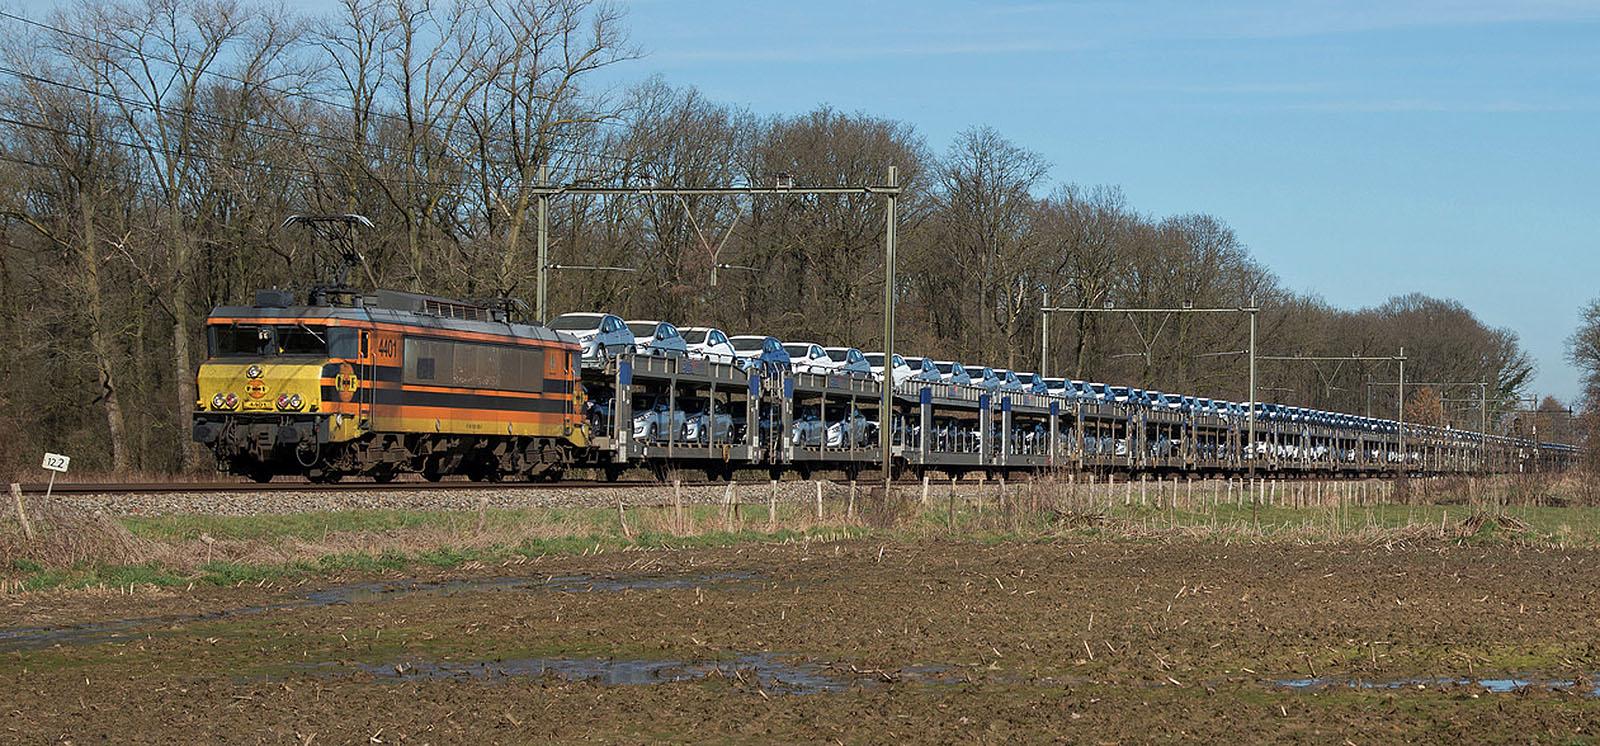 [NL] Railcolor: former NS locomotives series 1600